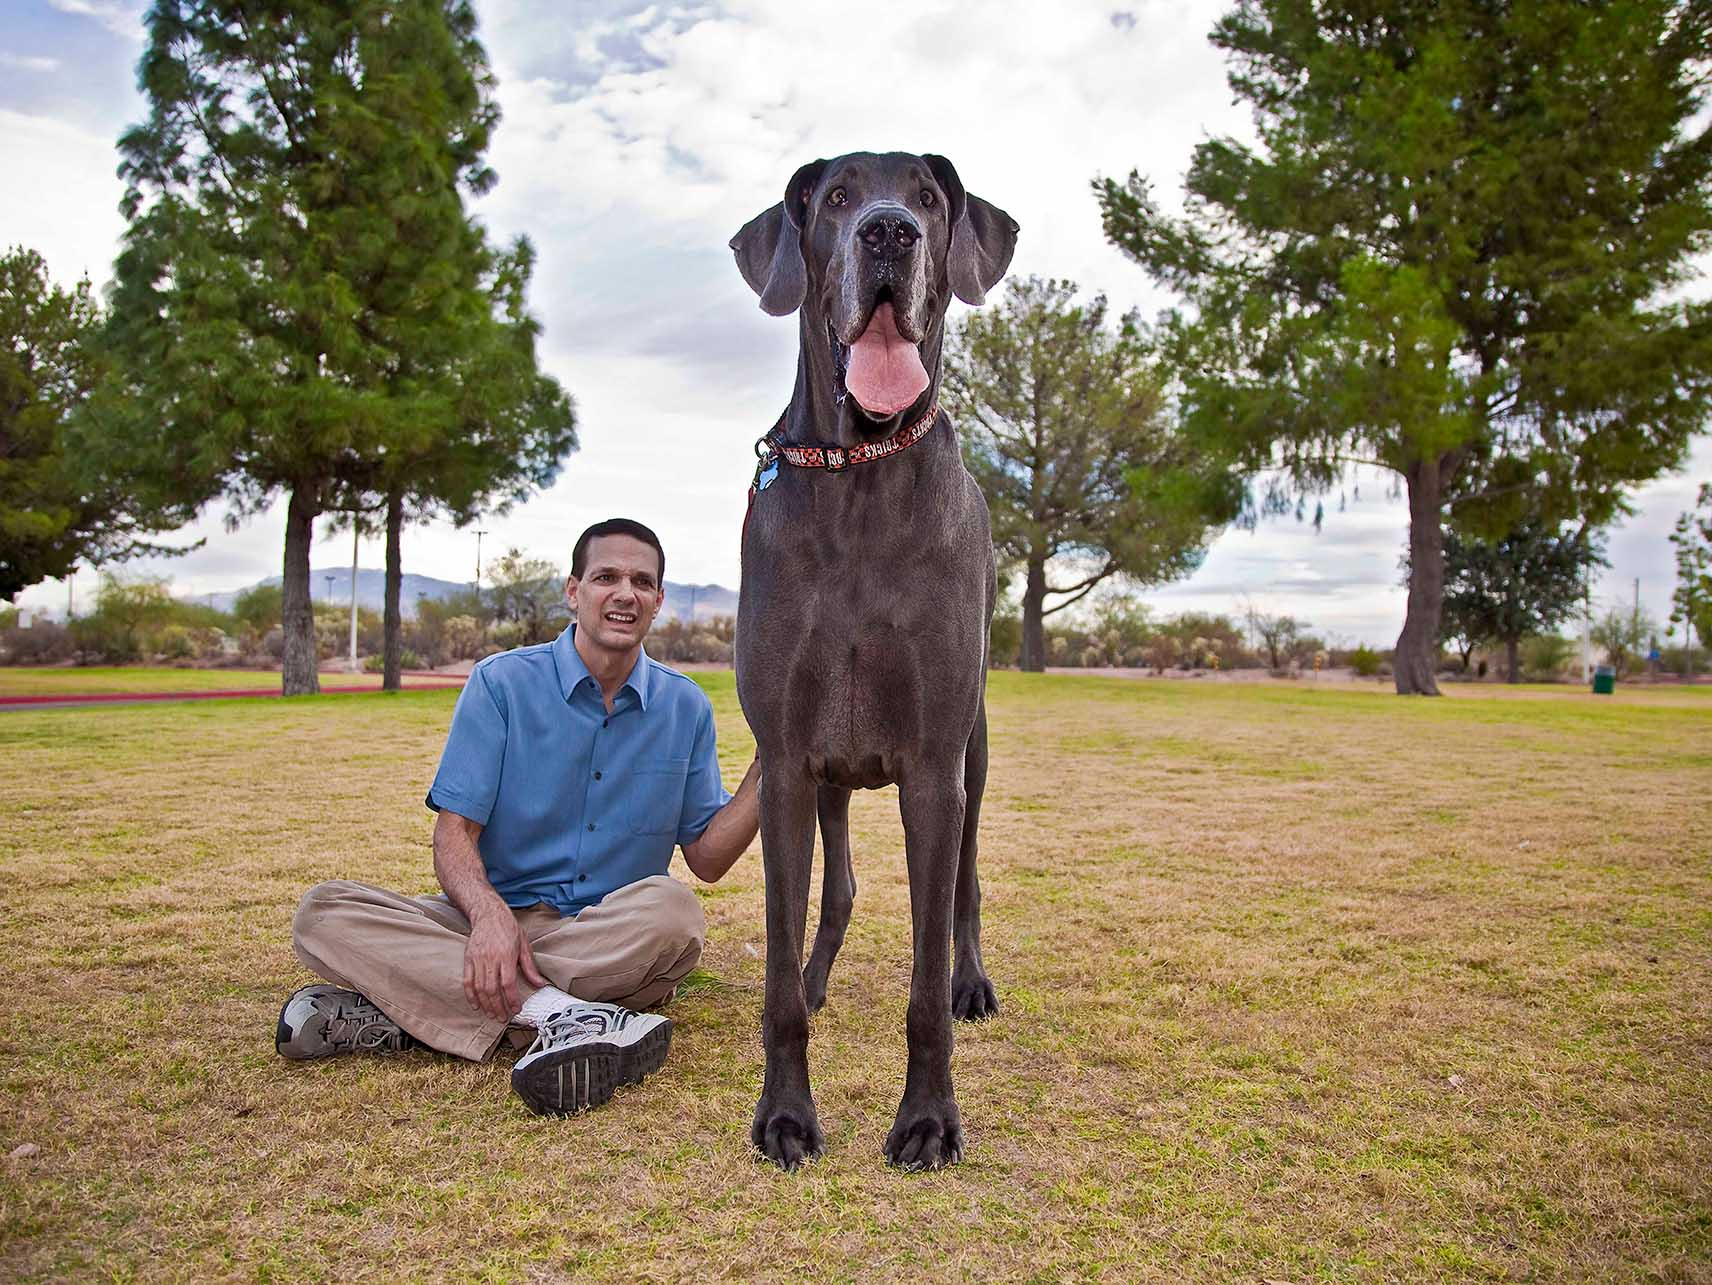 Giant George - Tallest Dog Ever & Tallest Living Dog